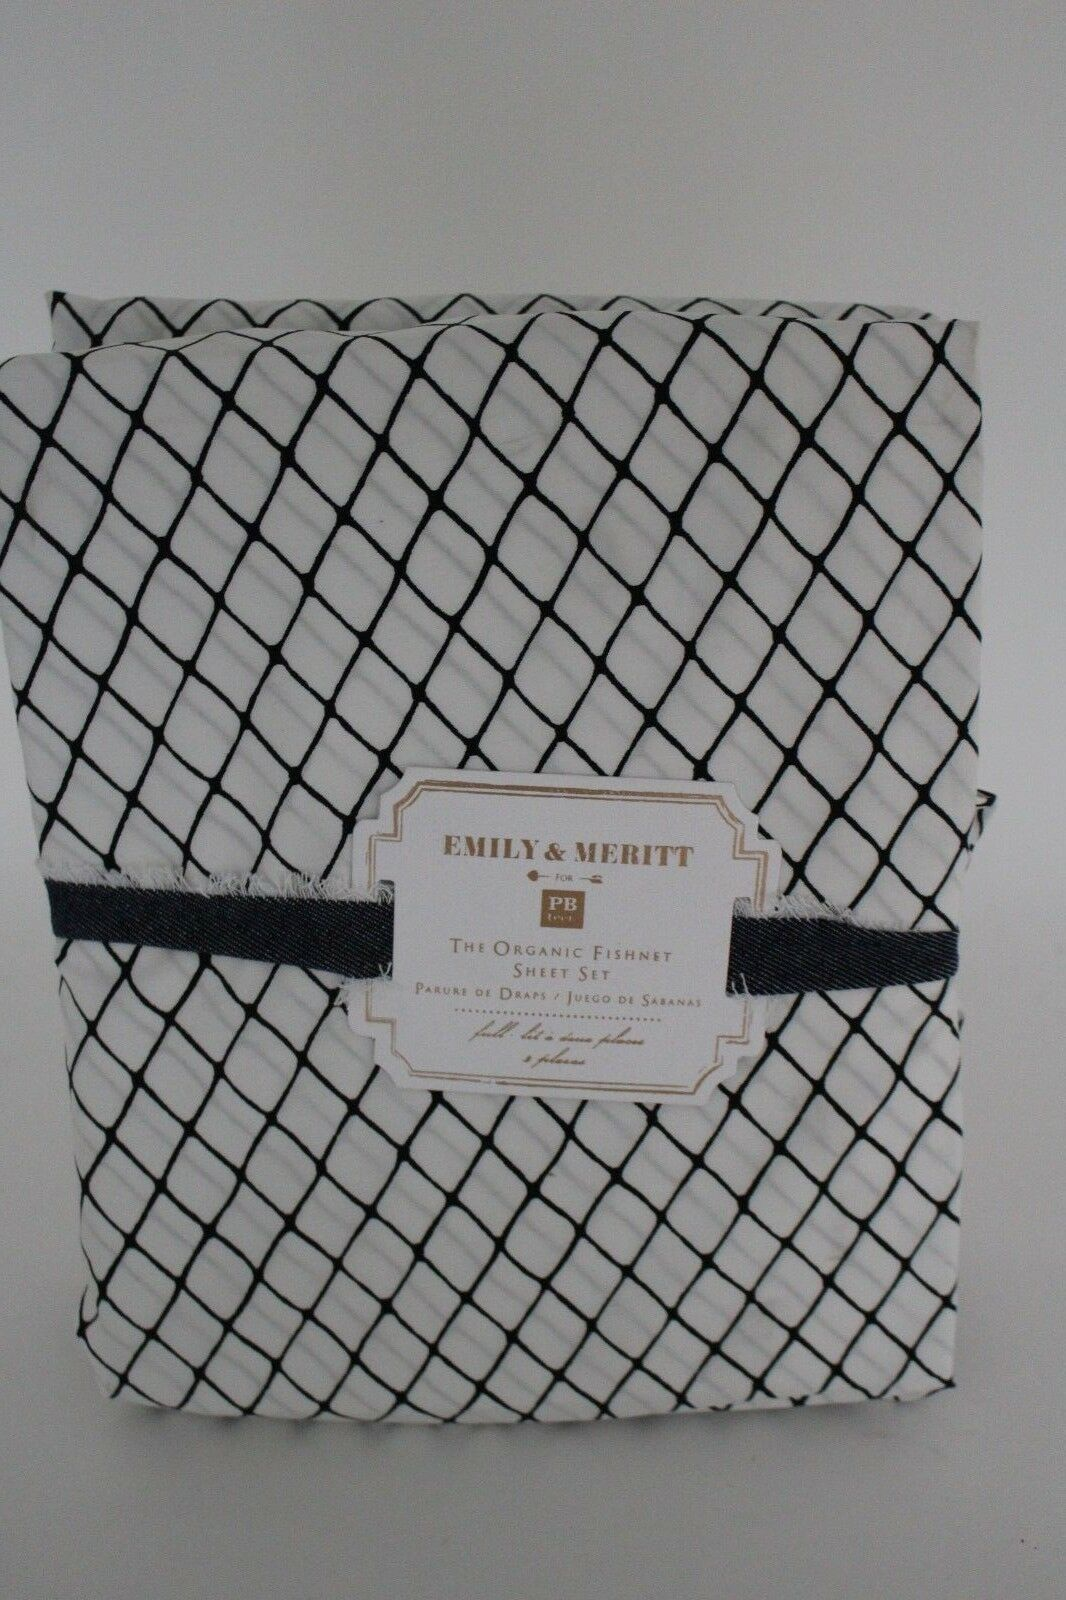 Neuf avec étiquettes POTTERY BARN PB Teen Emily & Meritt Organic résille Feuille Set, pleine, noir